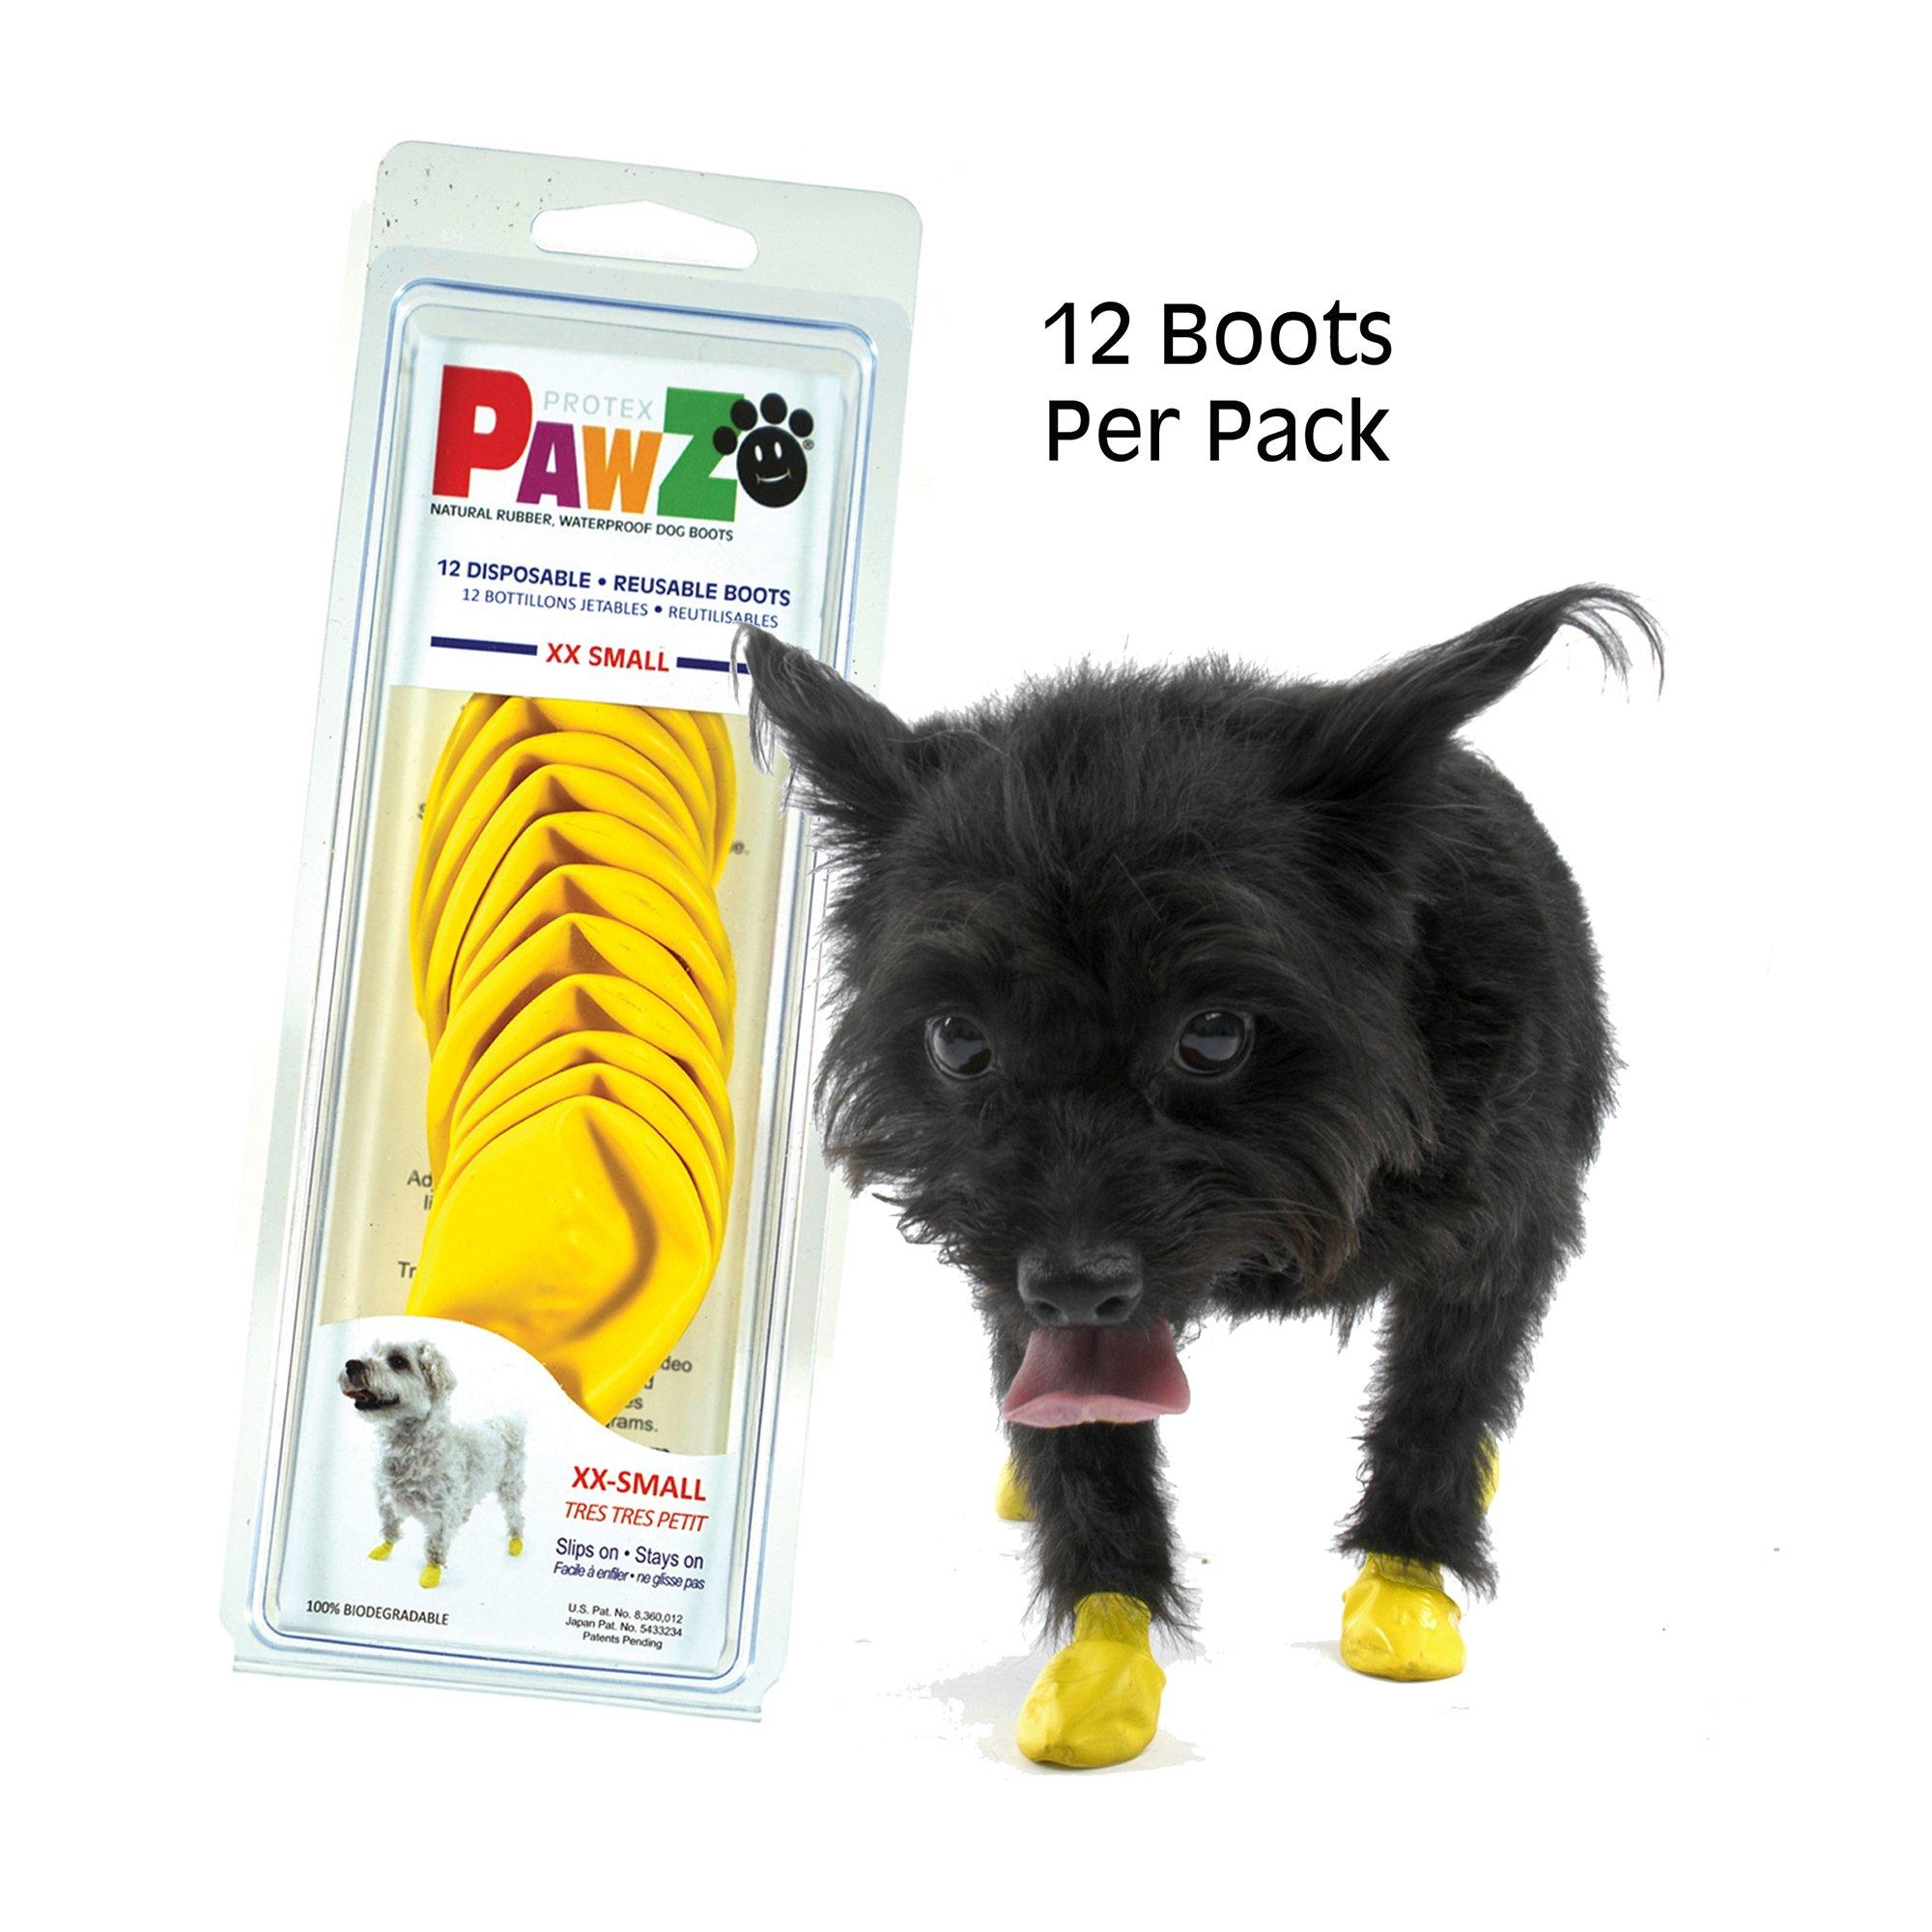 PAWZ Dog Boots - Waterproof Dog Boots - petco.com b14d9ec26969